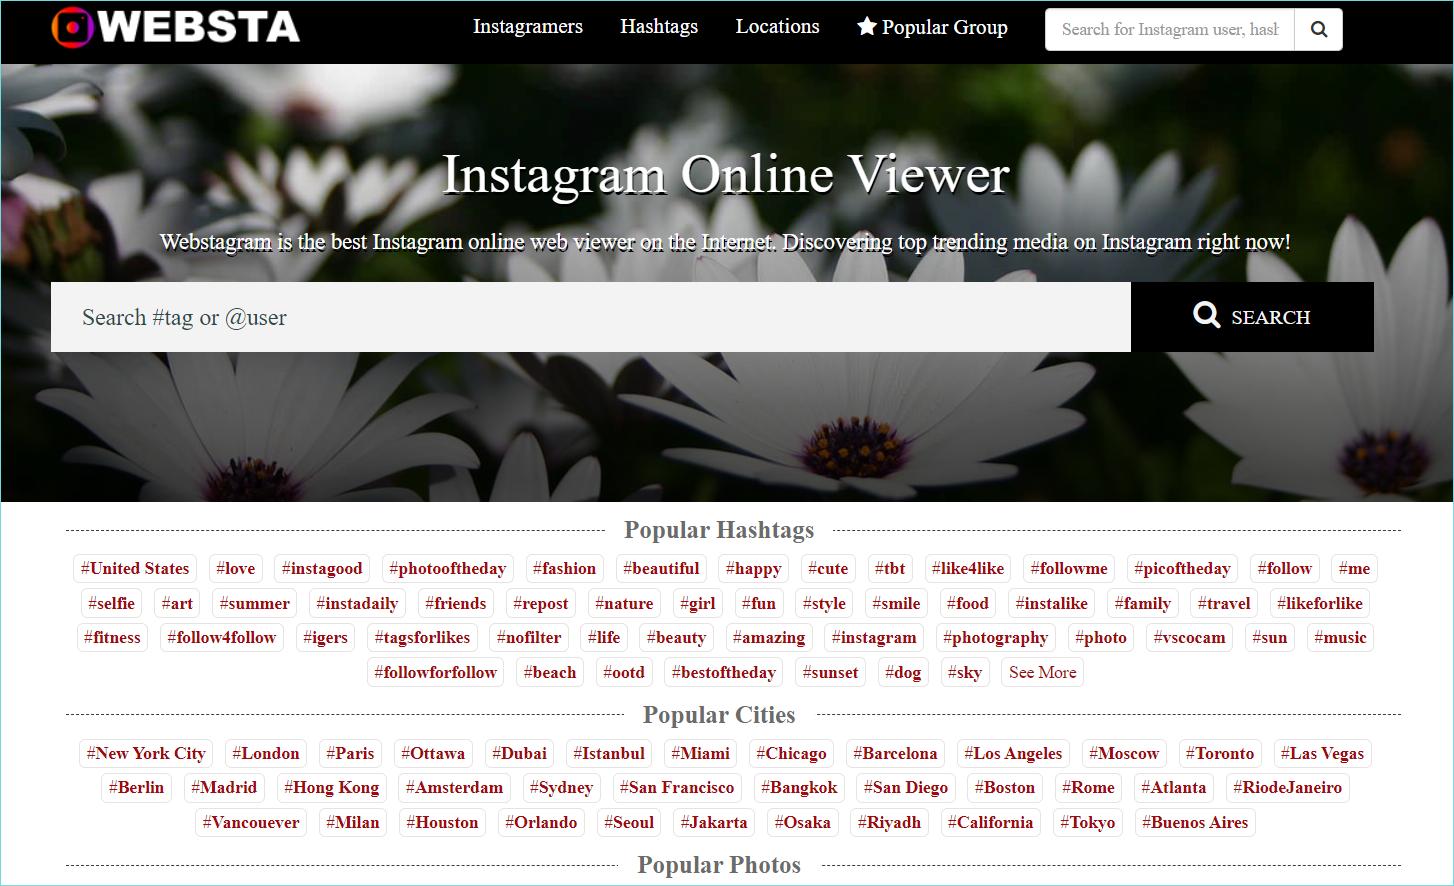 Интерфейс сервиса Webstagram